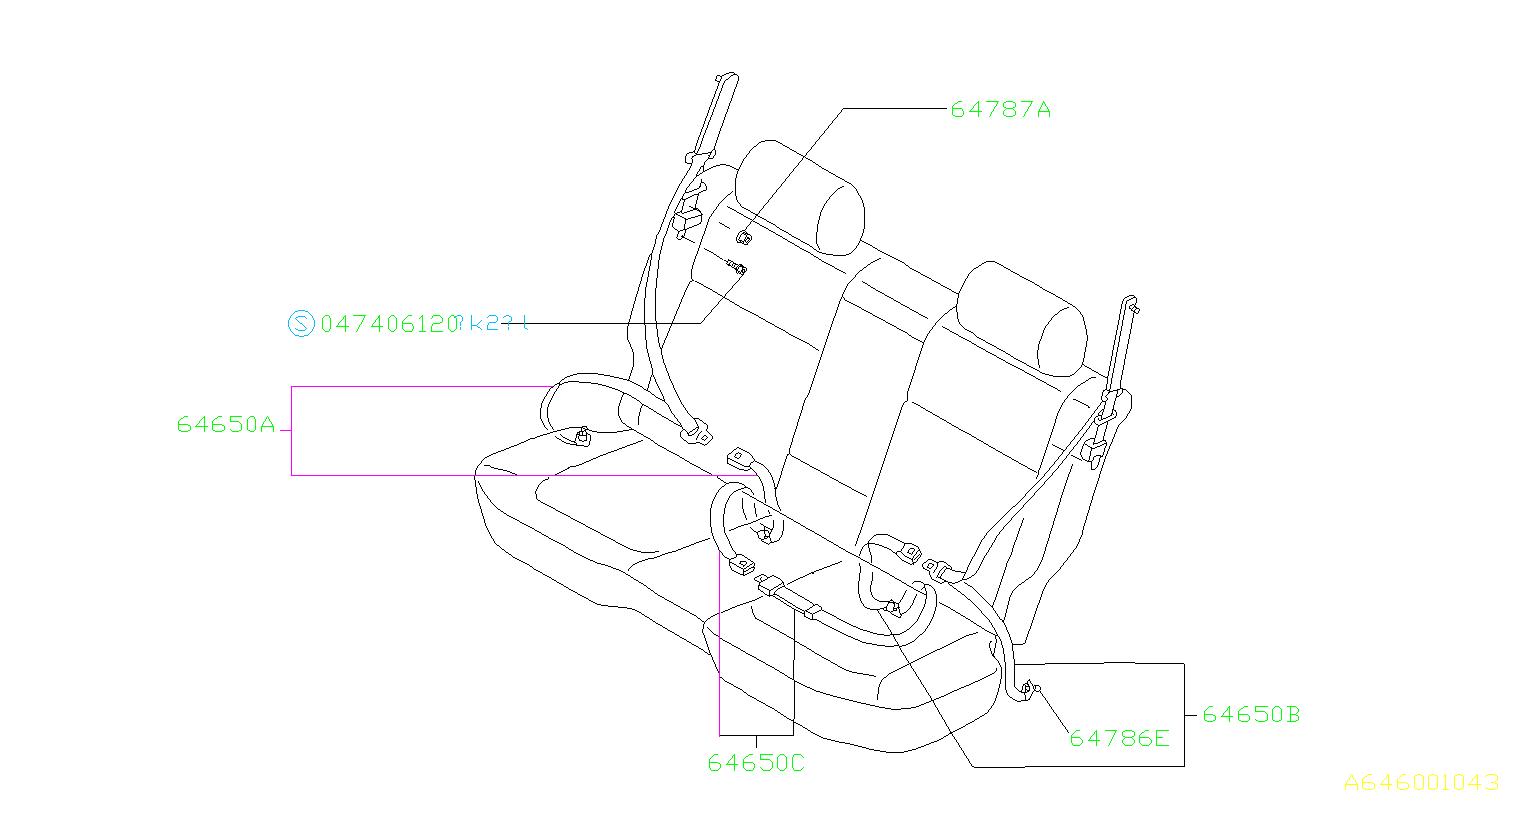 Subaru Forester Seat Belt Lap And Shoulder Belt  Right